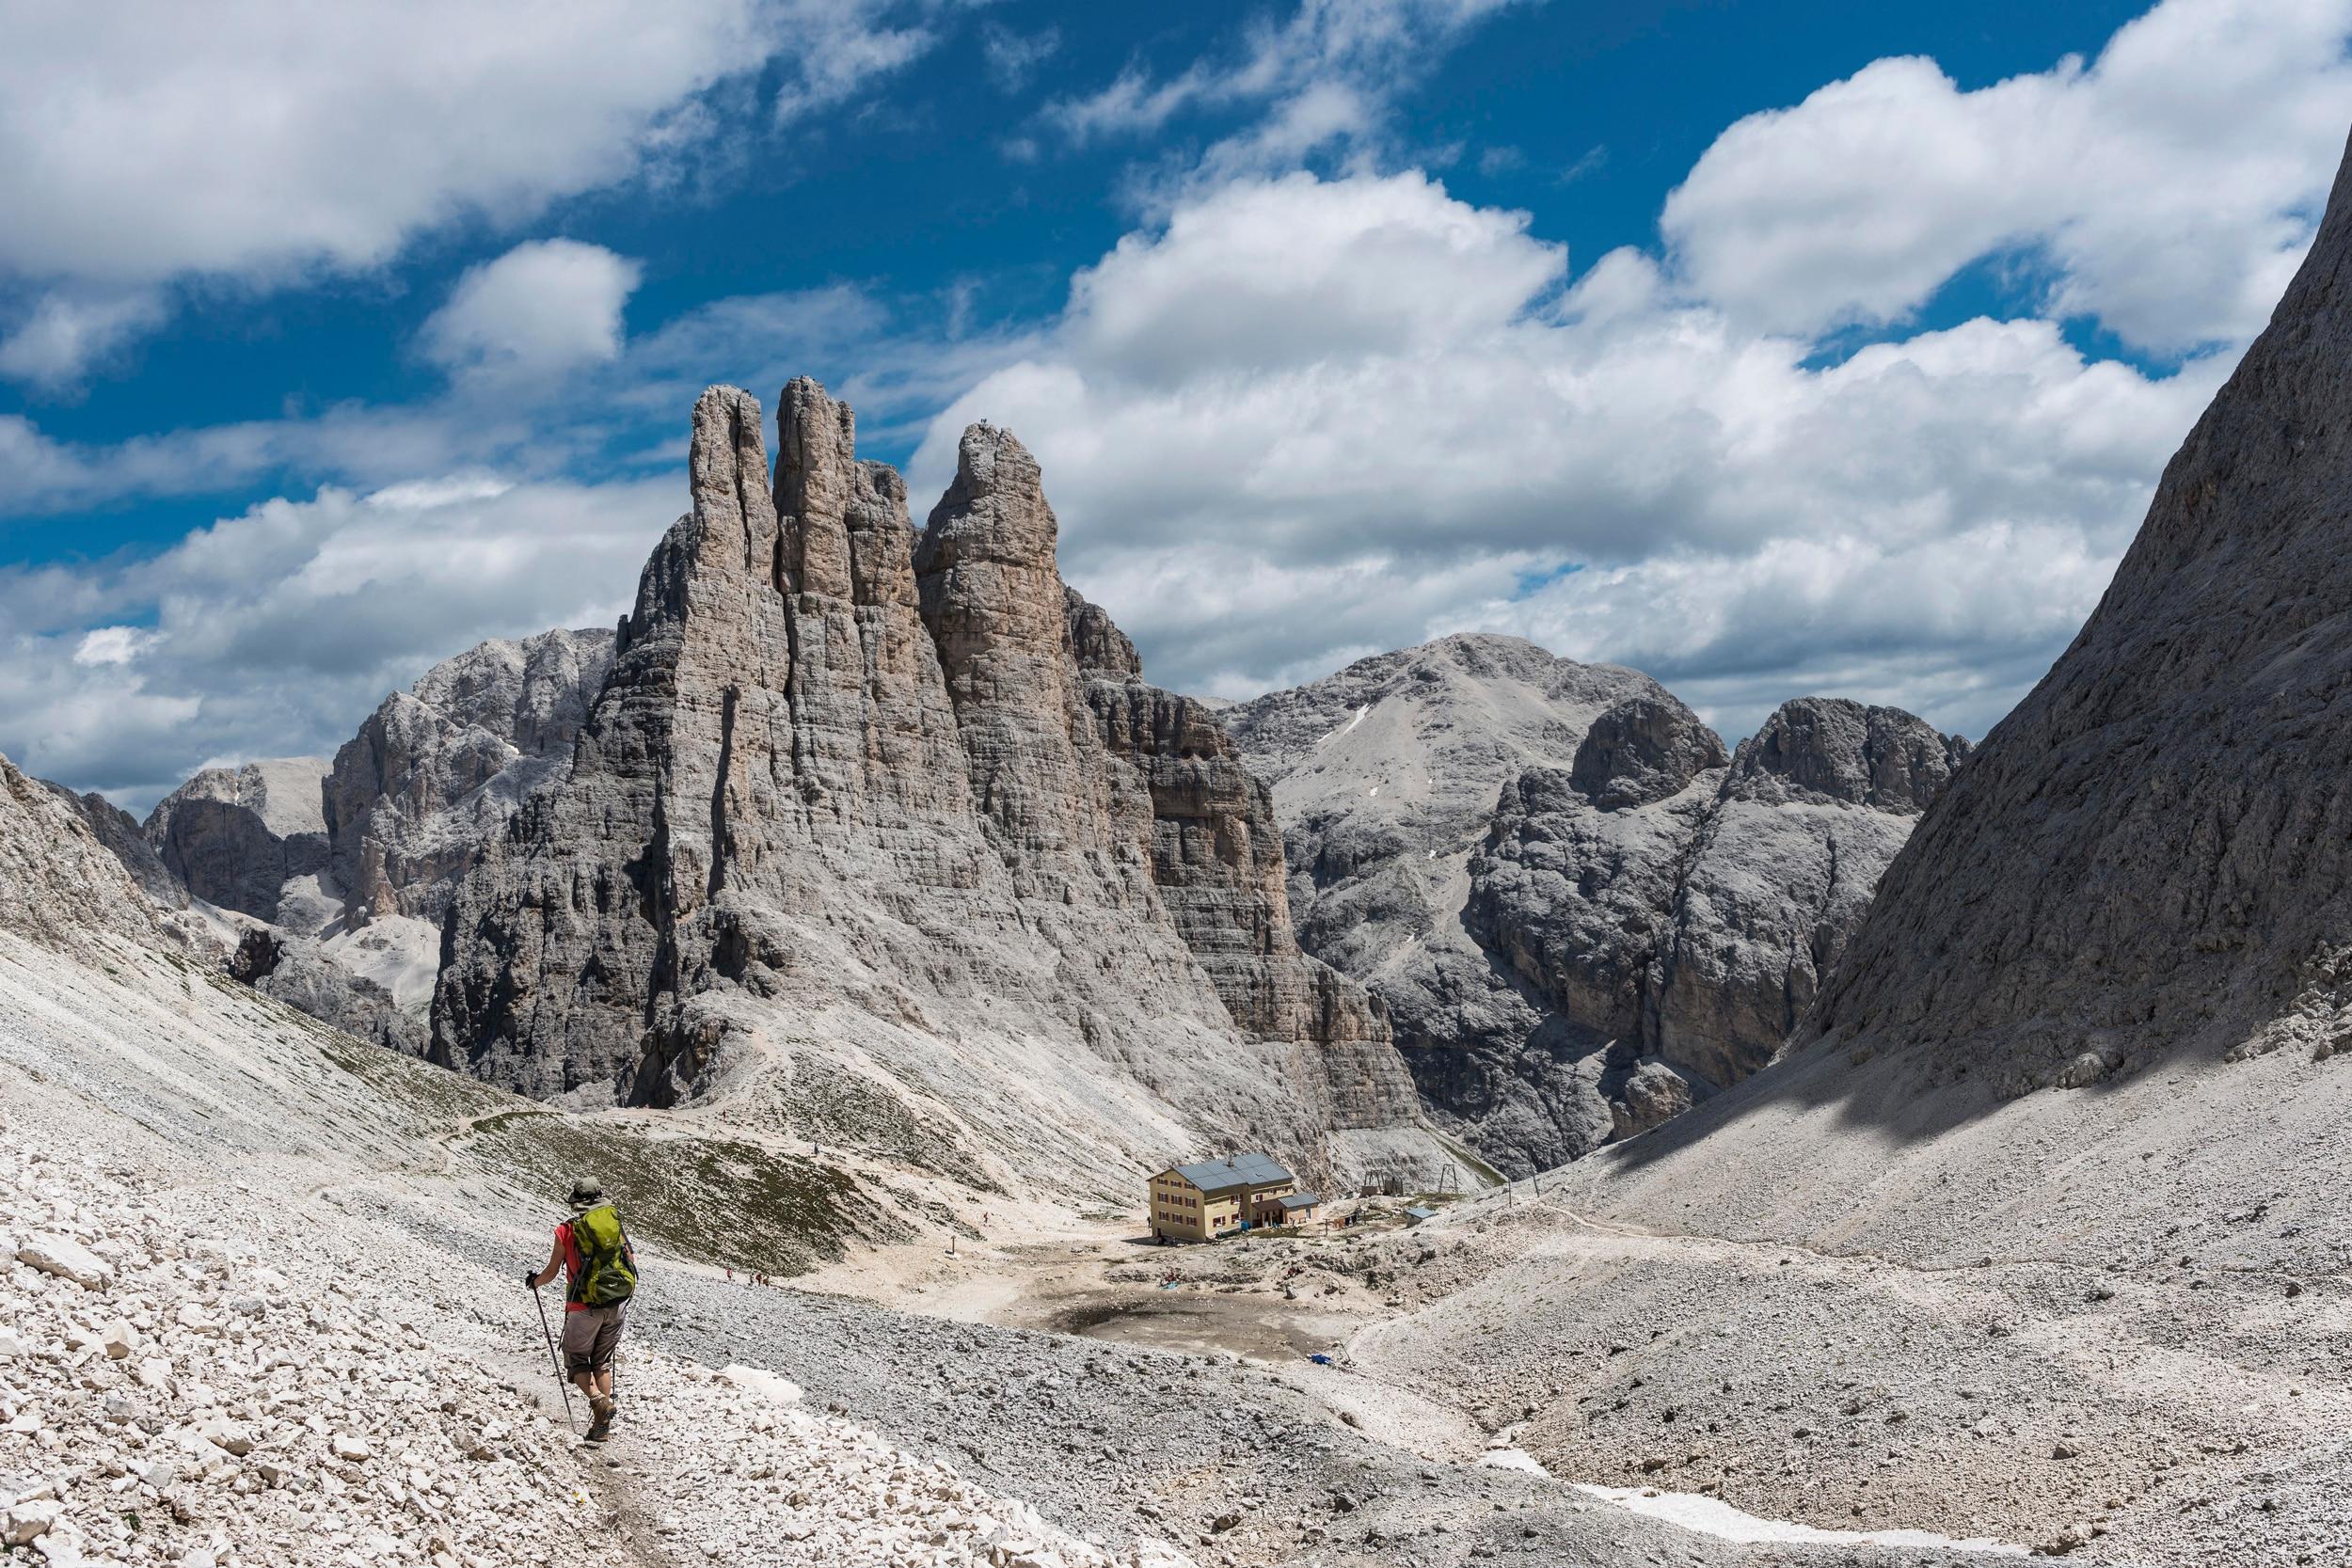 Klettersteig Rosengarten : Terrex mountain project: der schauplatz bergwelten